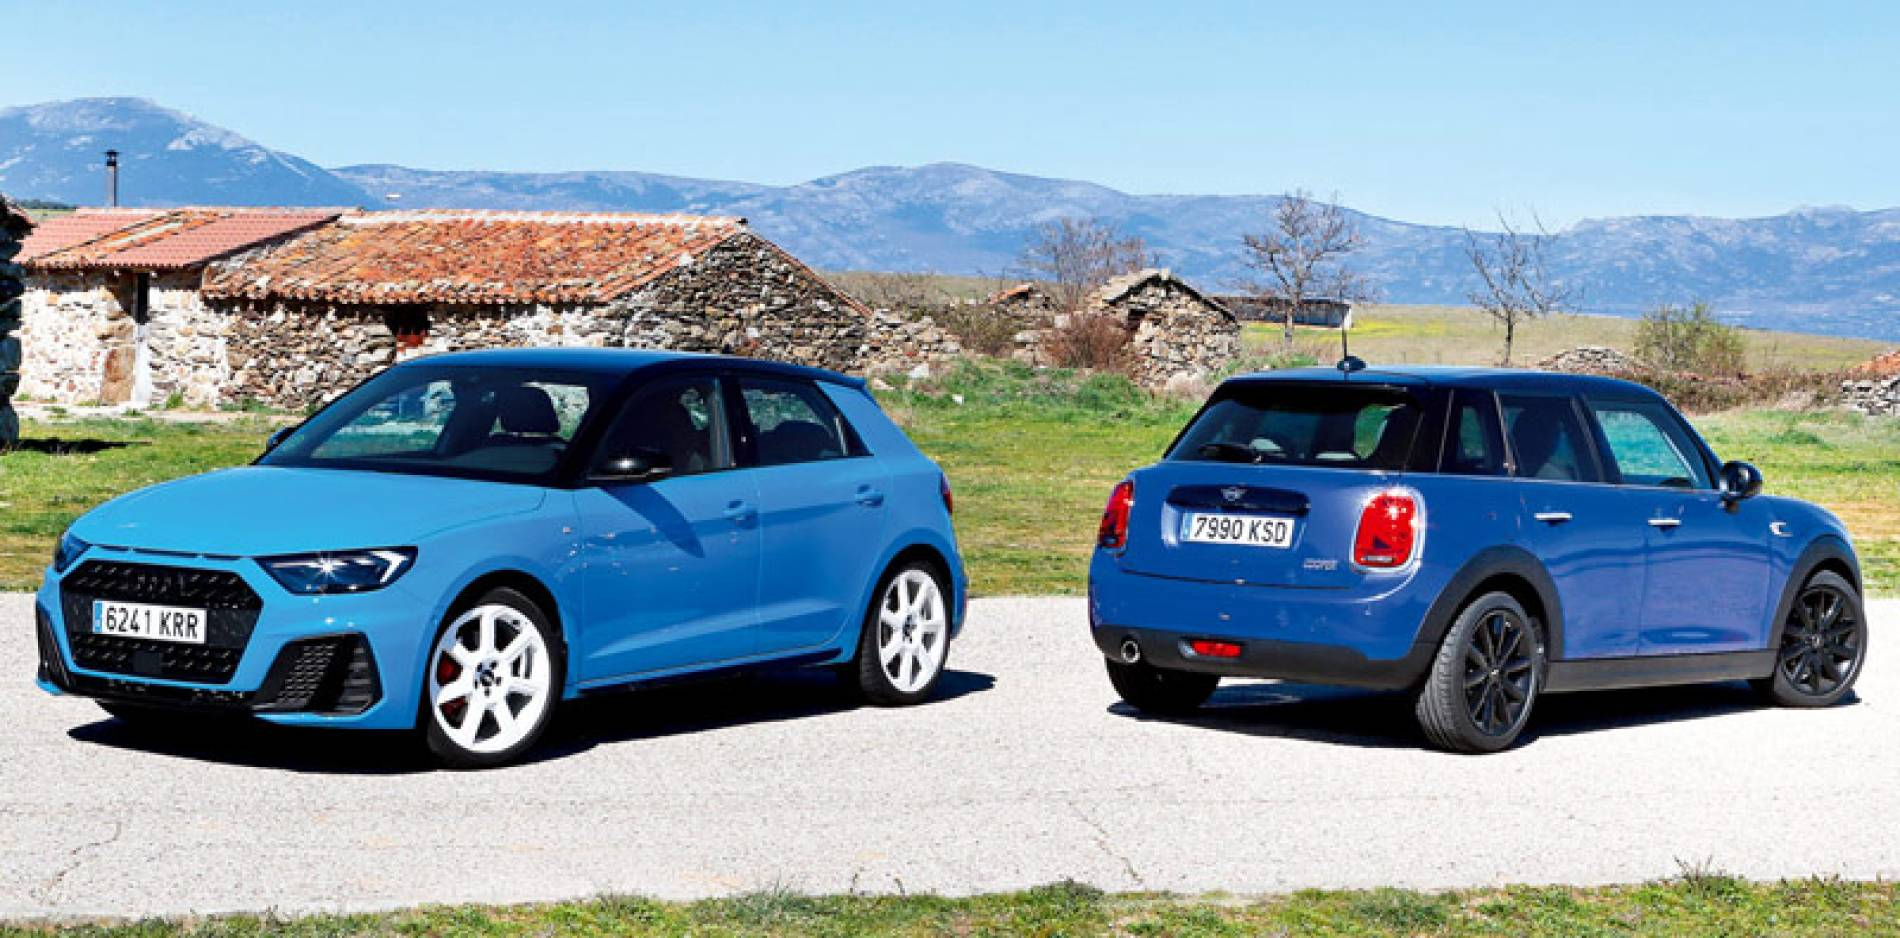 Comparativa de urbanitas premium: Audi A1 Sportback vs MINI Cooper